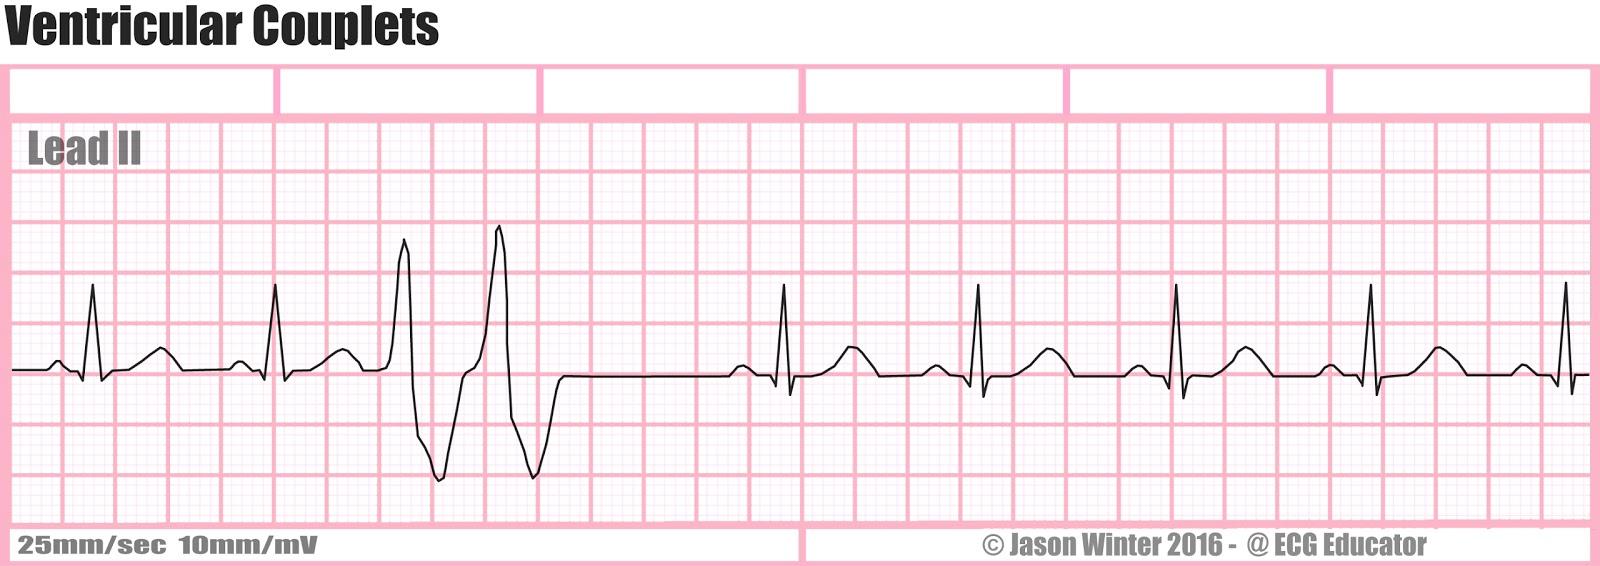 ECG Educator Blog : Ventricular Couplets